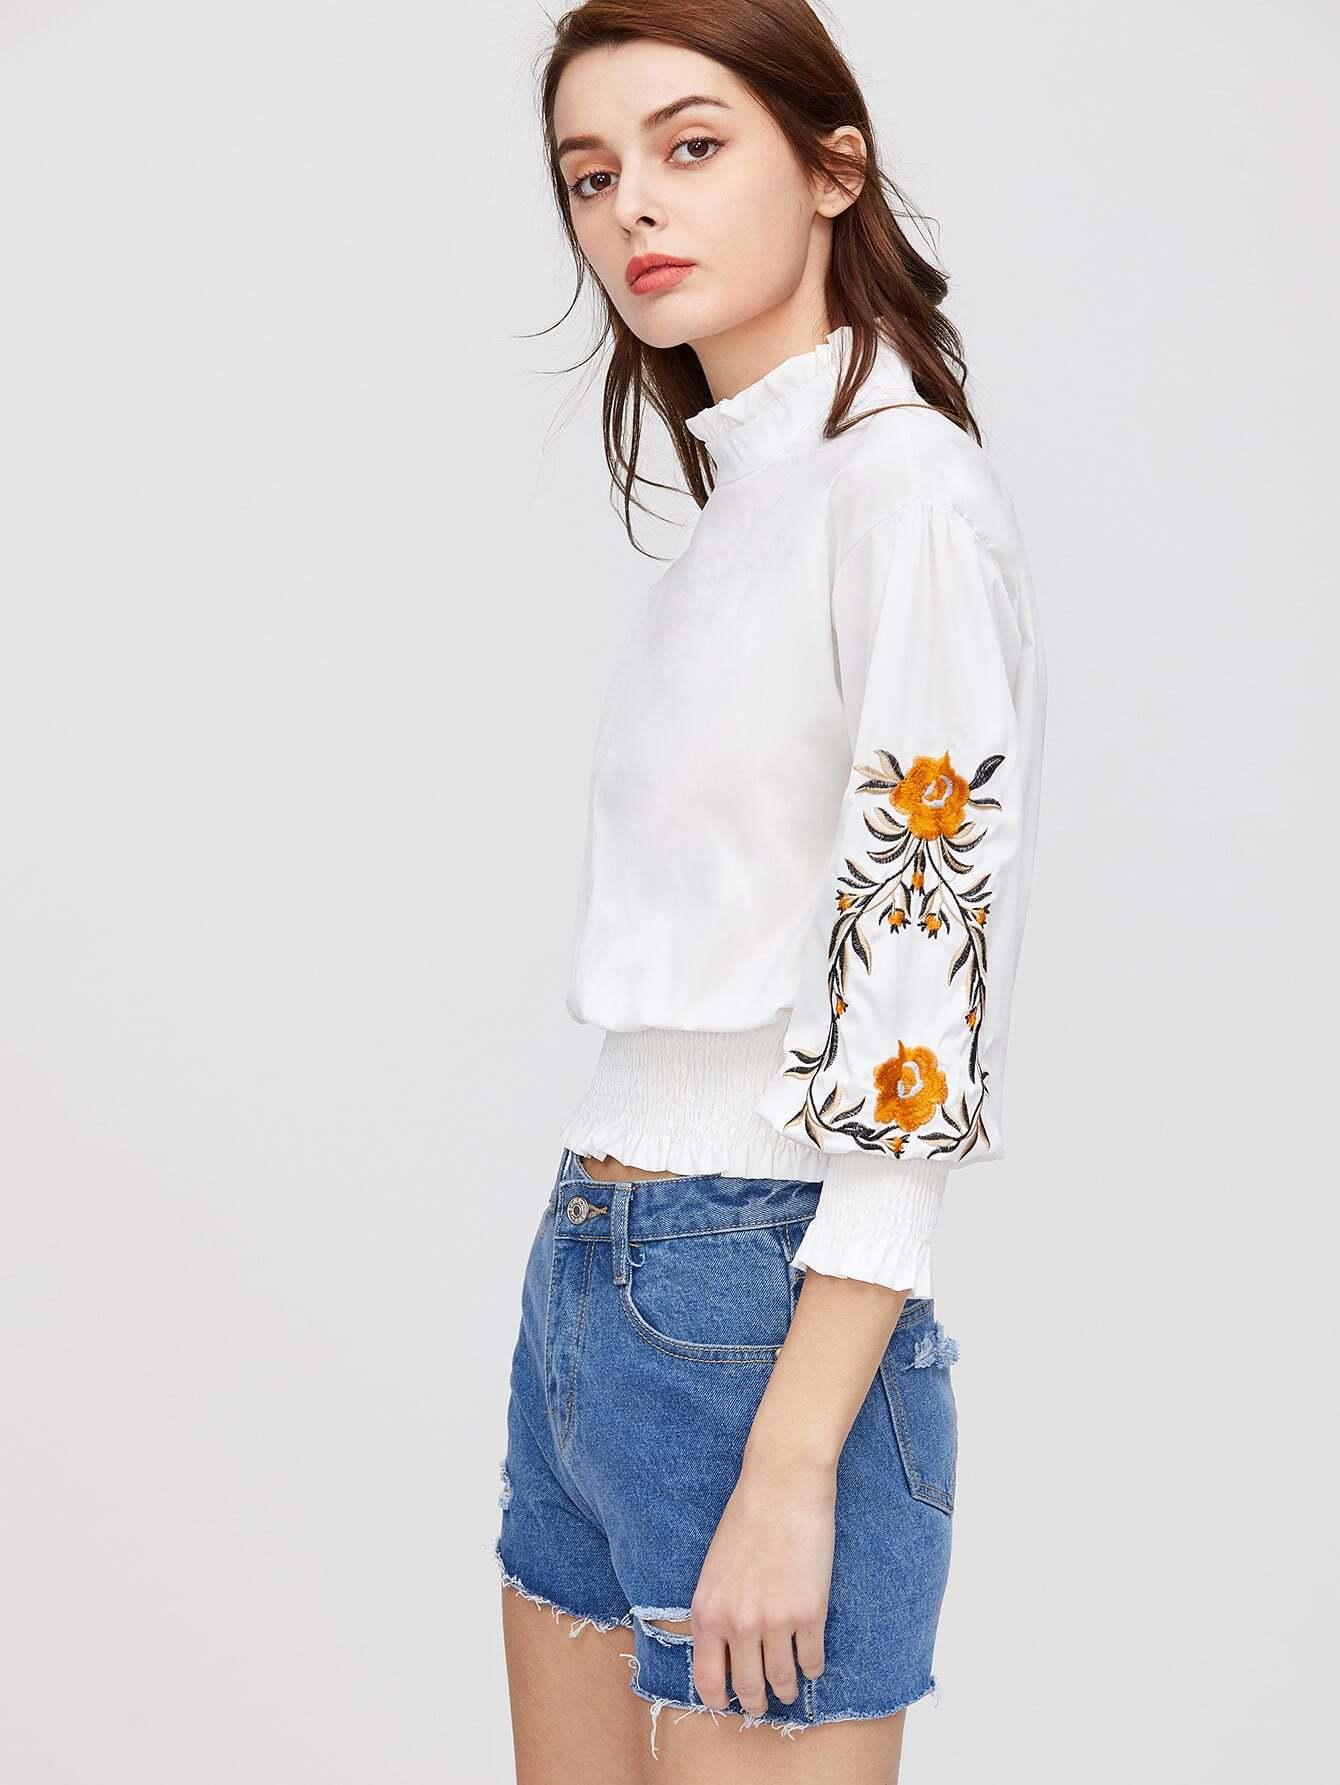 blouse170308103_2